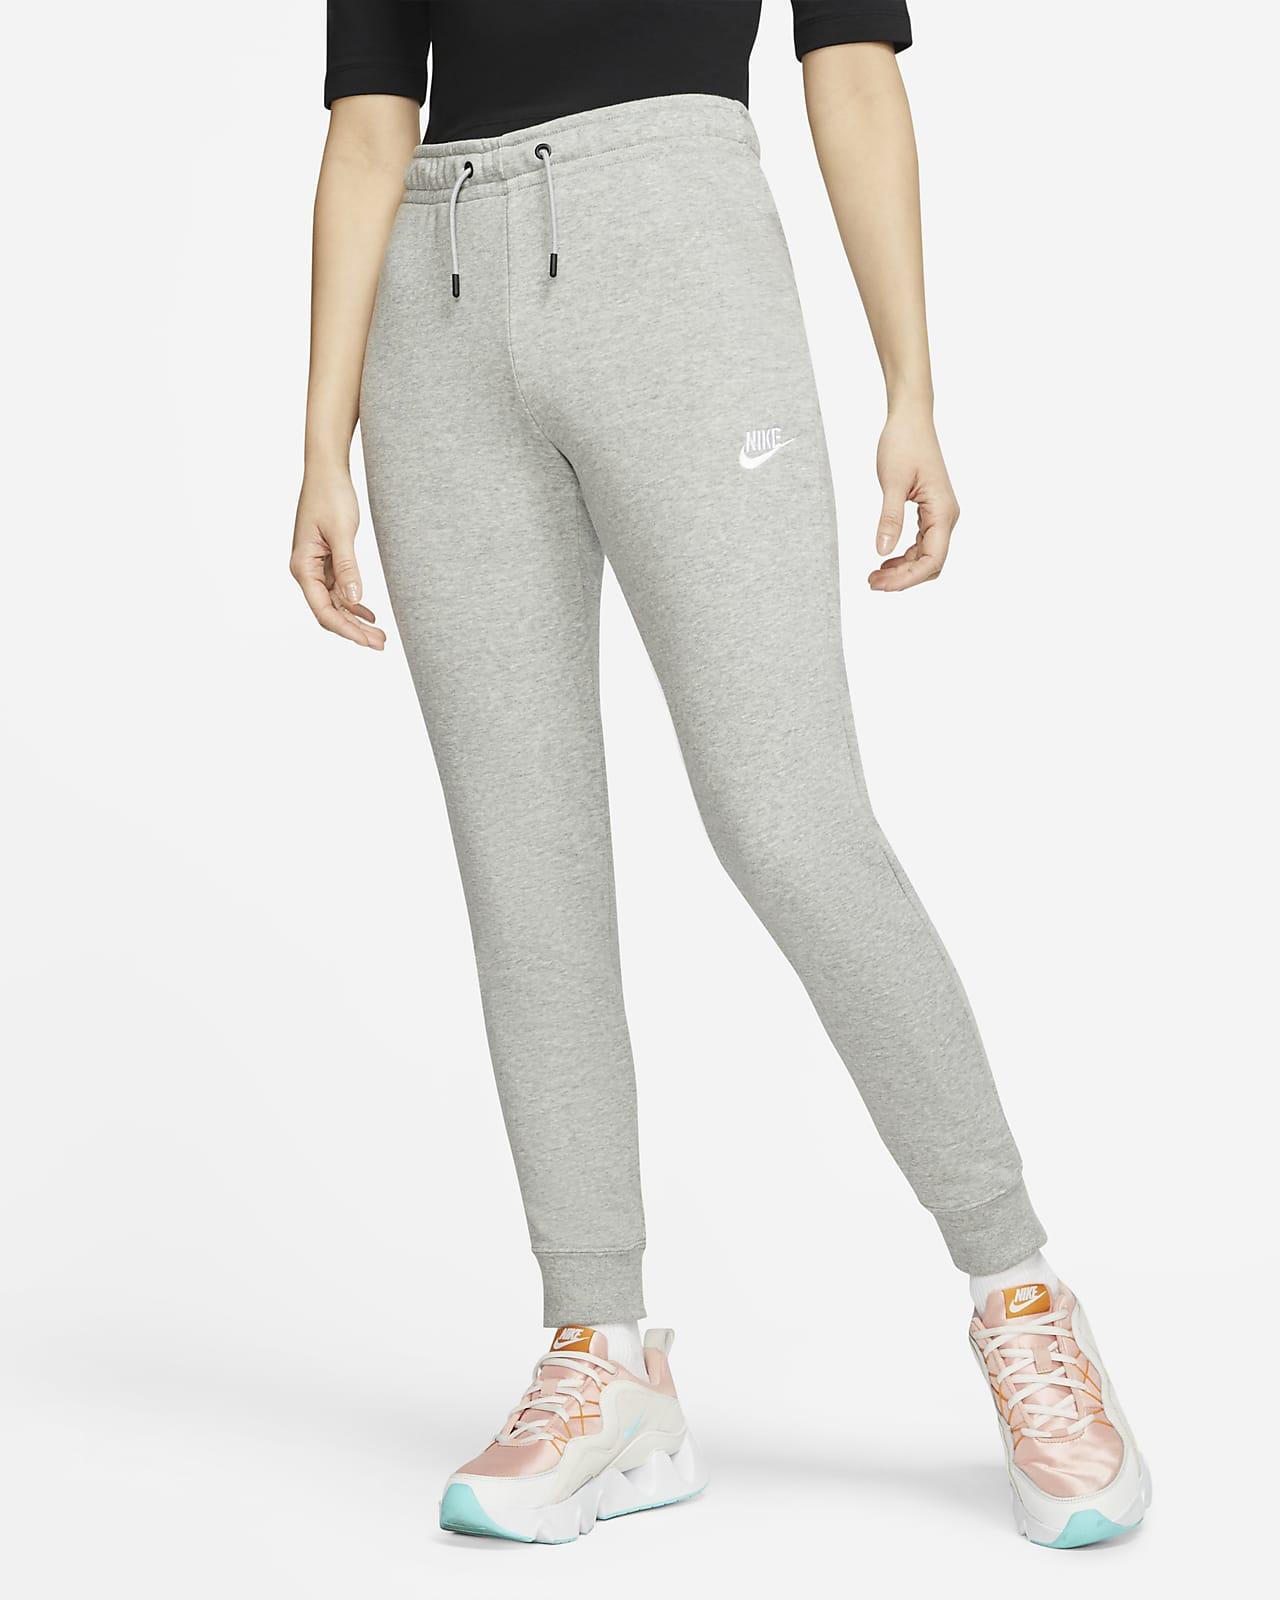 Pantaloni in fleece a vita media Nike Sportswear Essentials - Donna